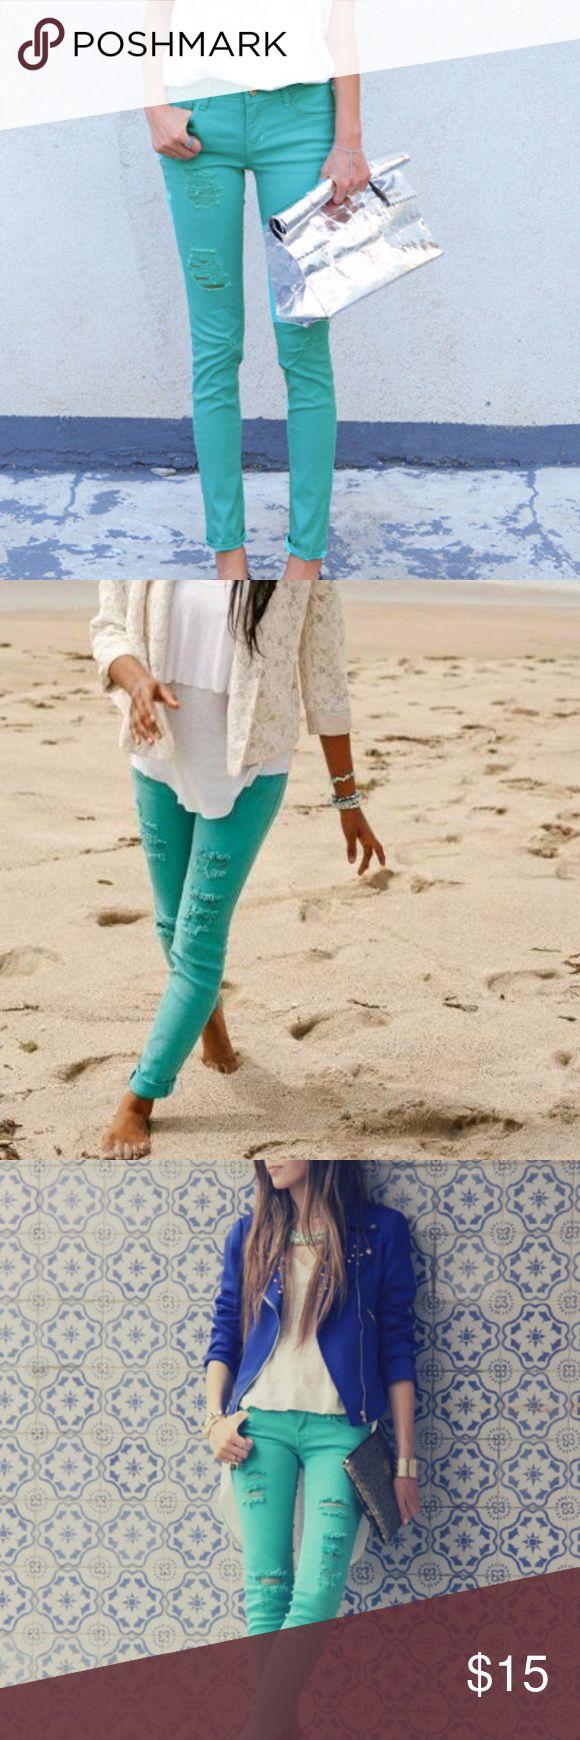 PacSun aqua jeans Aqua distressed jeans PacSun Jeans Skinny